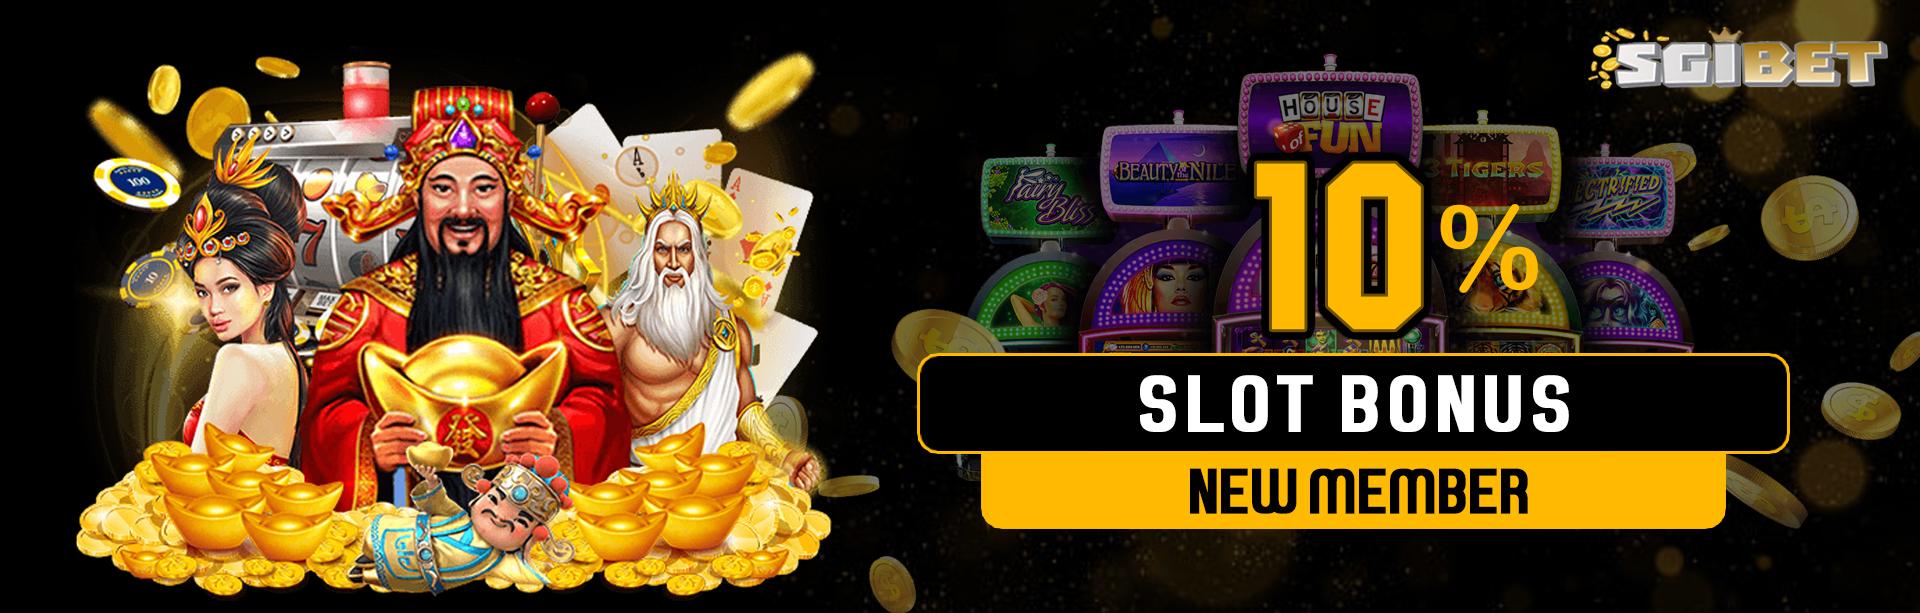 Bonus Deposit New Member Slot 10%